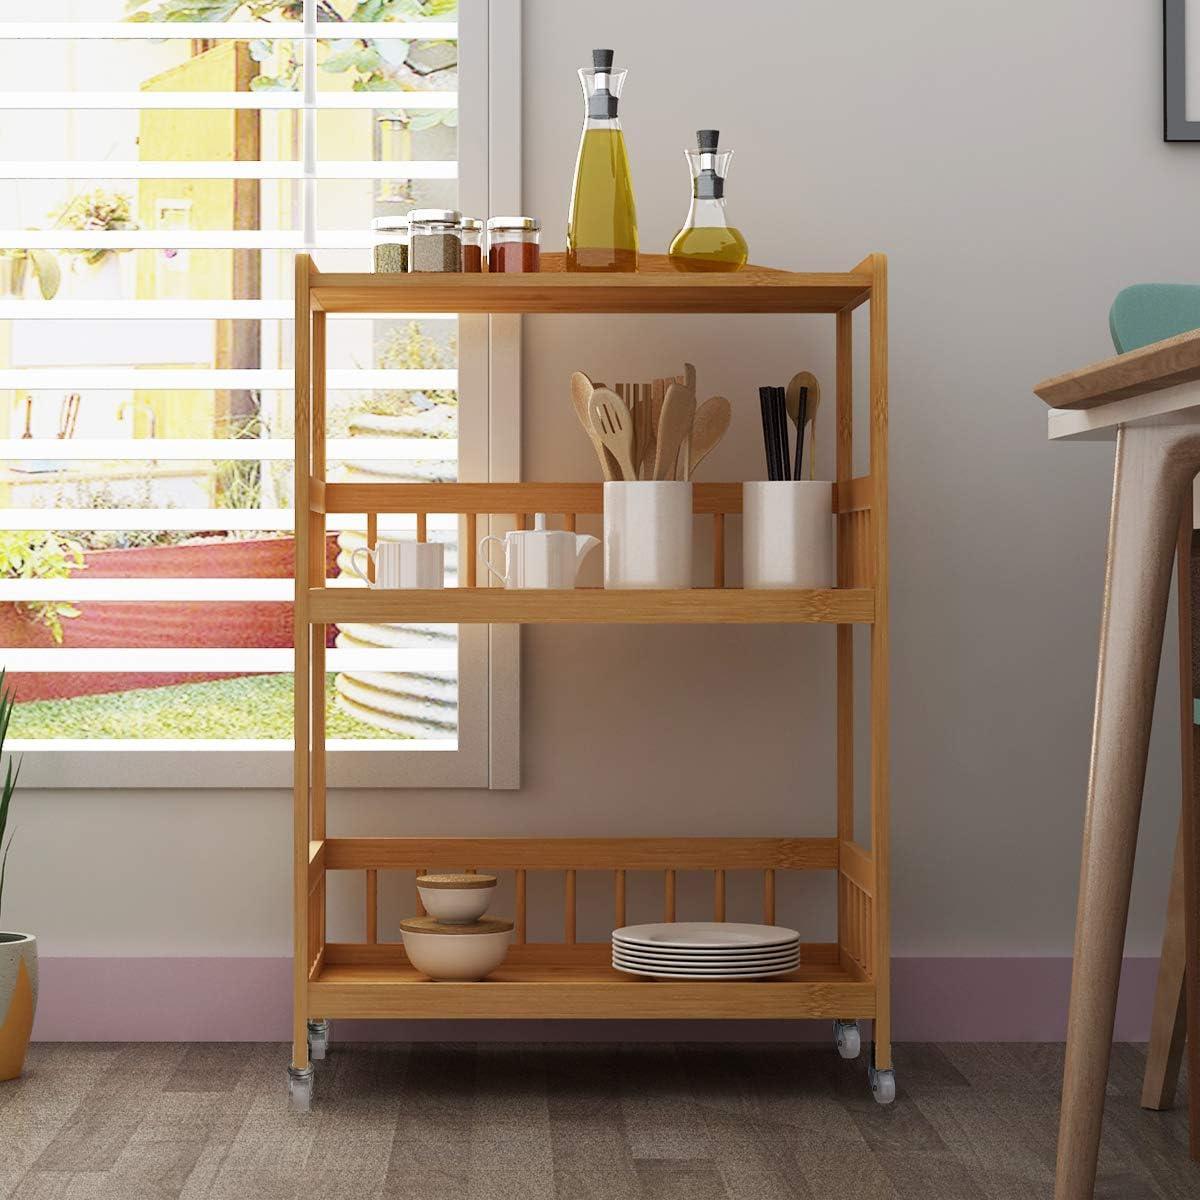 80 DlandHome DlandHome 3-Tier Storage Shelf Unit On Wheels 30.5 Bamboo Storage Utility Cart for Kitchen//Warehouse 53